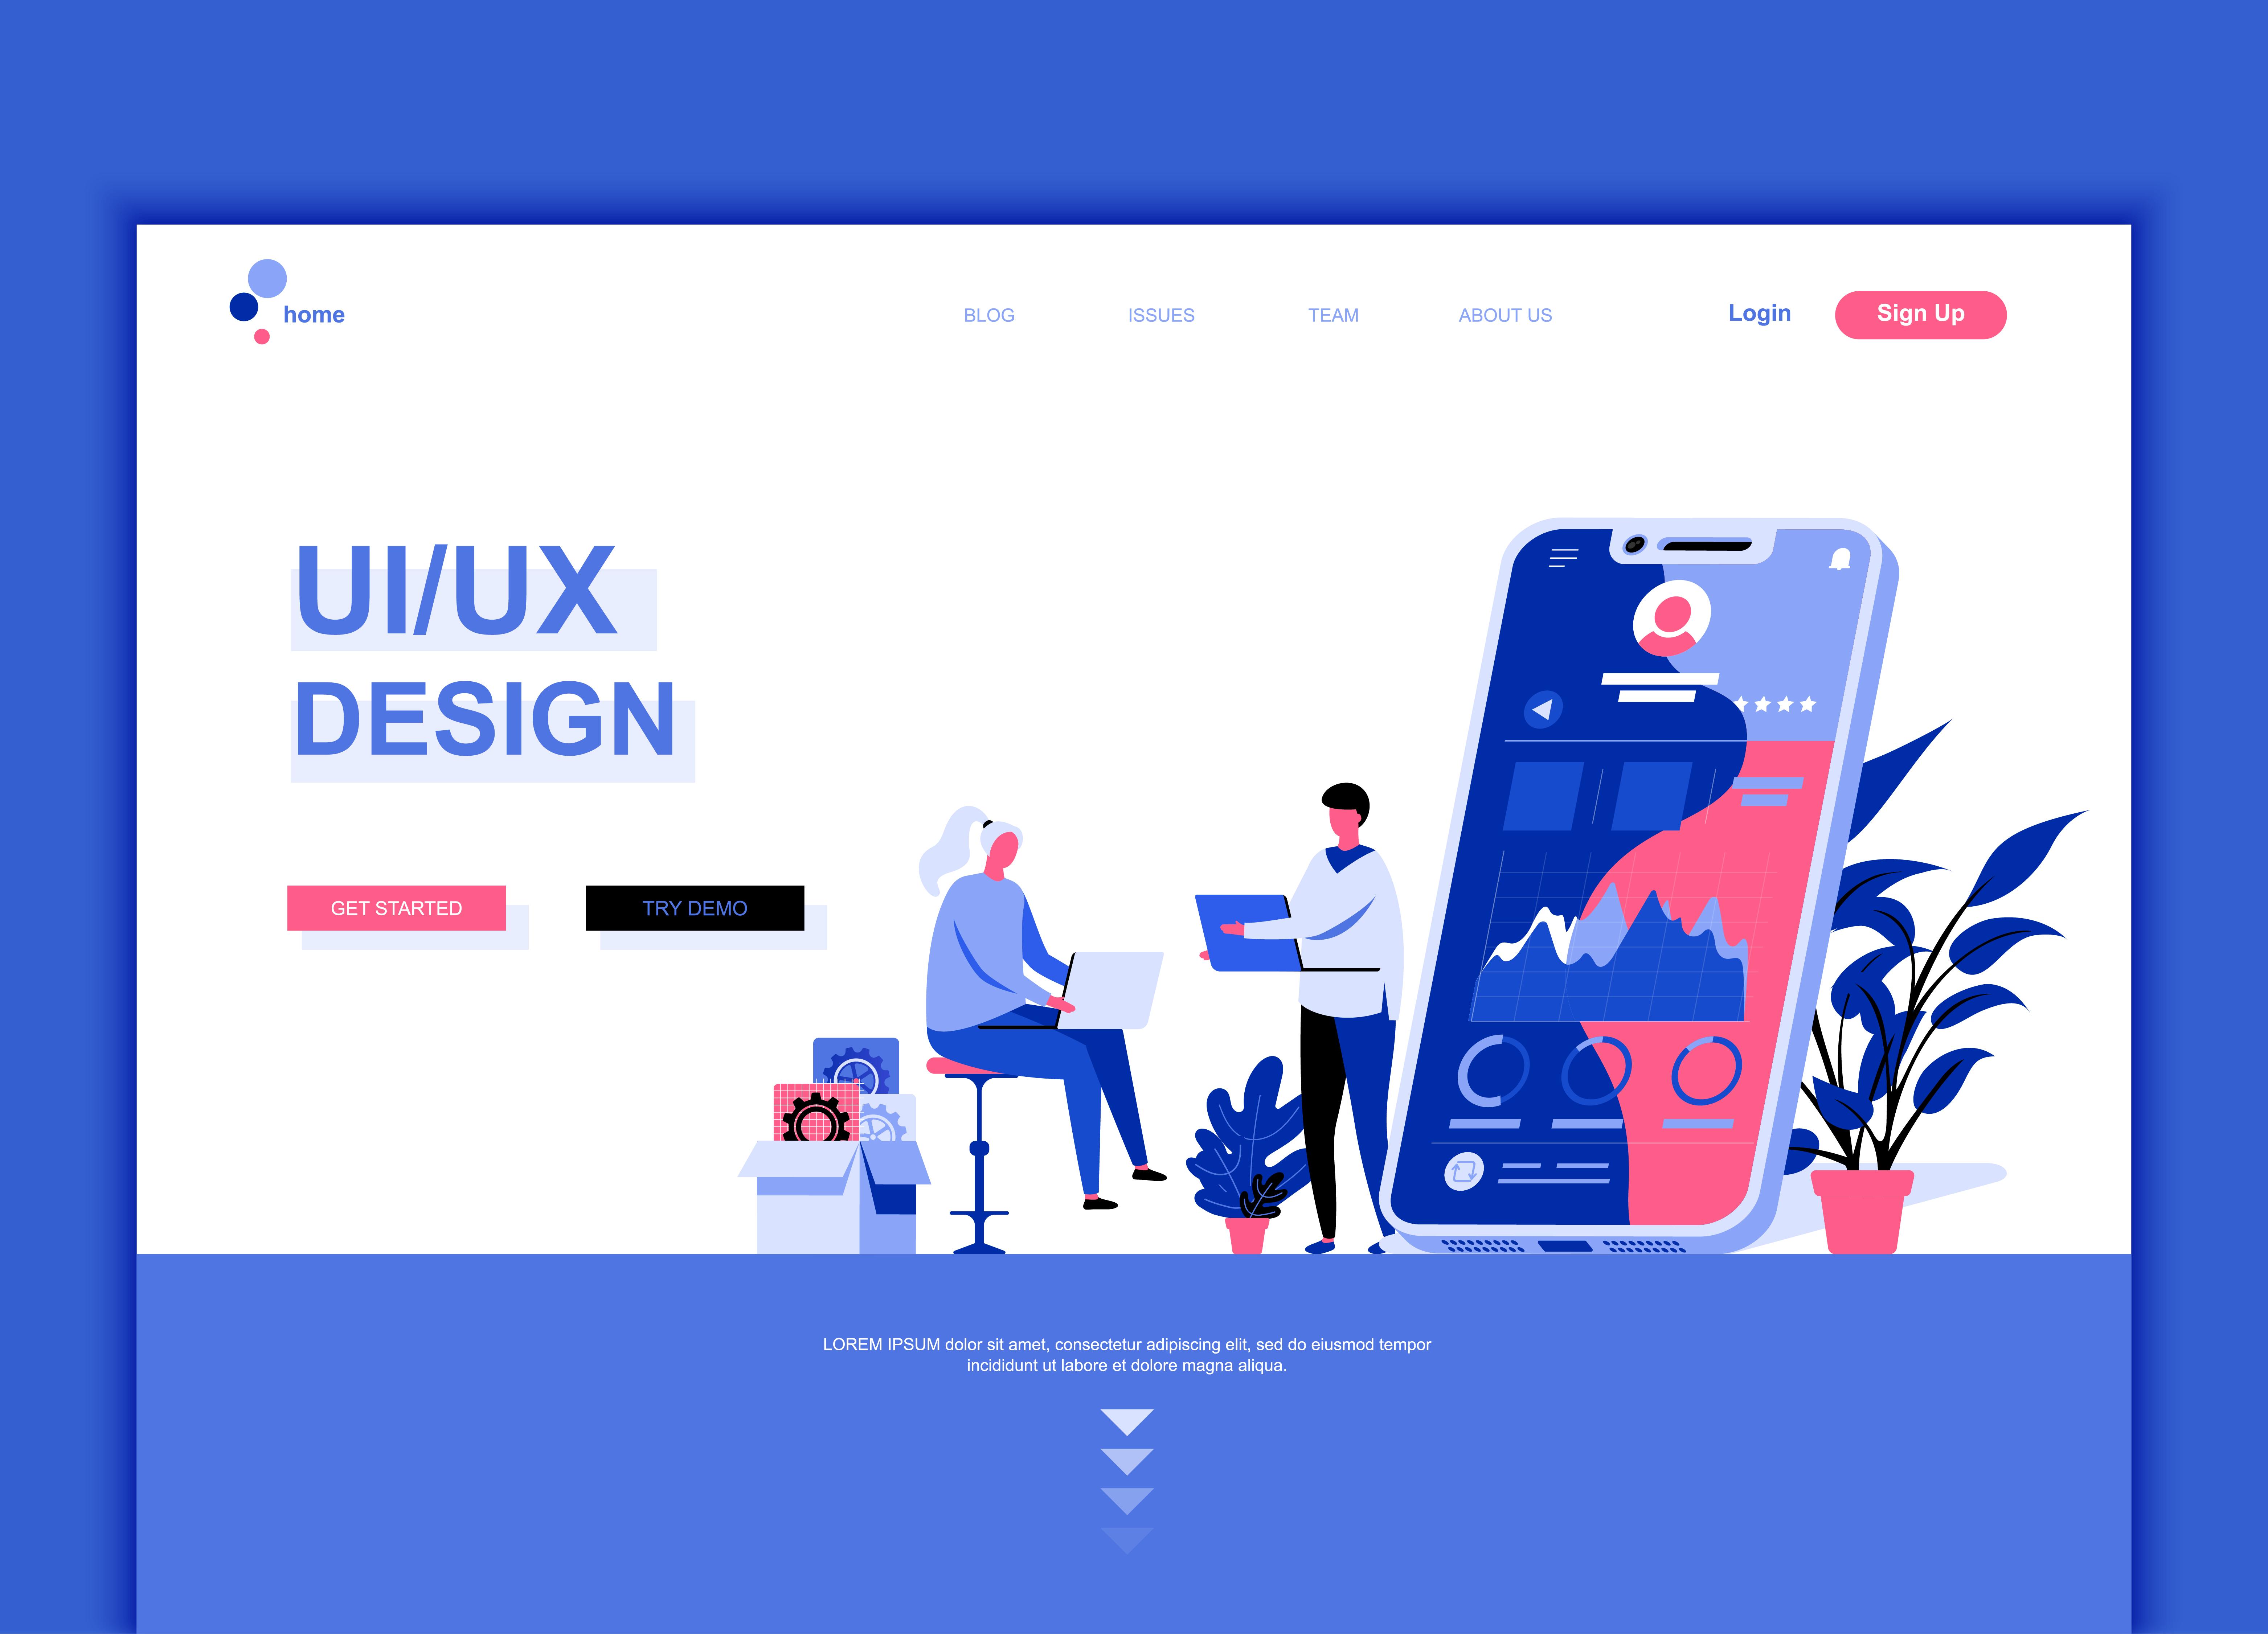 Vector Illustration Web Designs: Modern Flat Web Page Design Template Concept Of UX